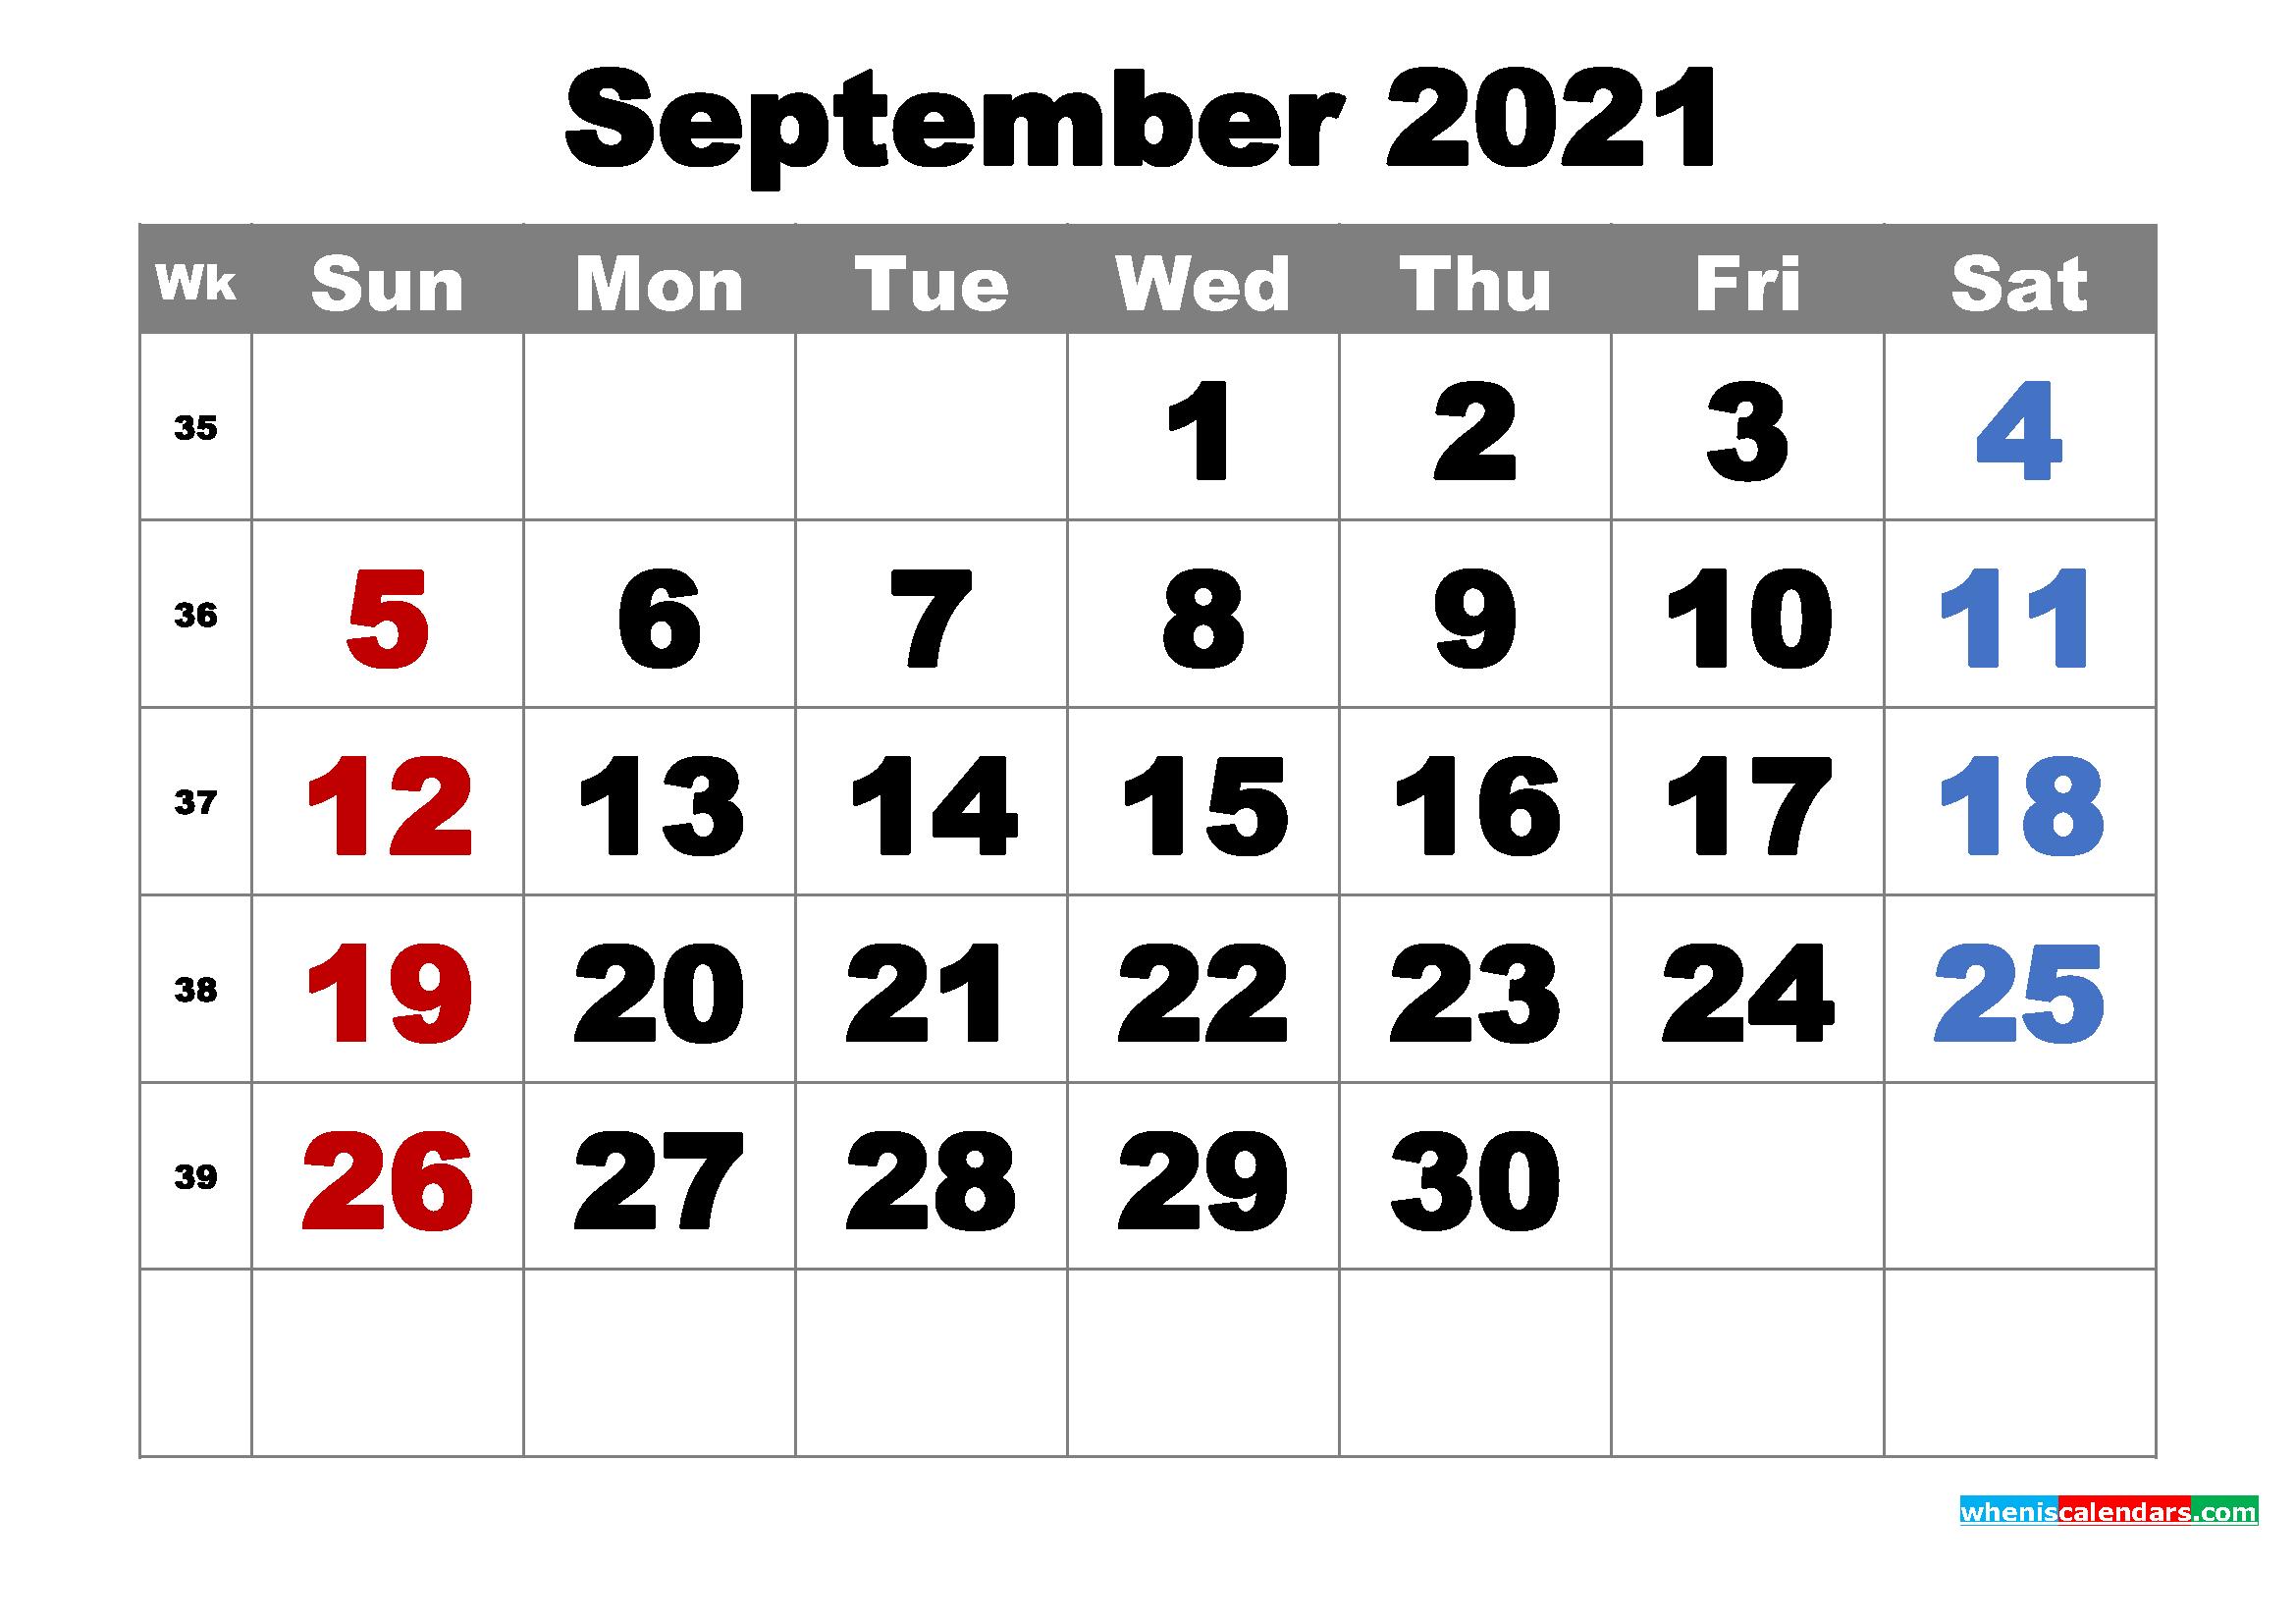 Free Printable September 2021 Calendar Word, Pdf, Image-2021 Absentee Calendar